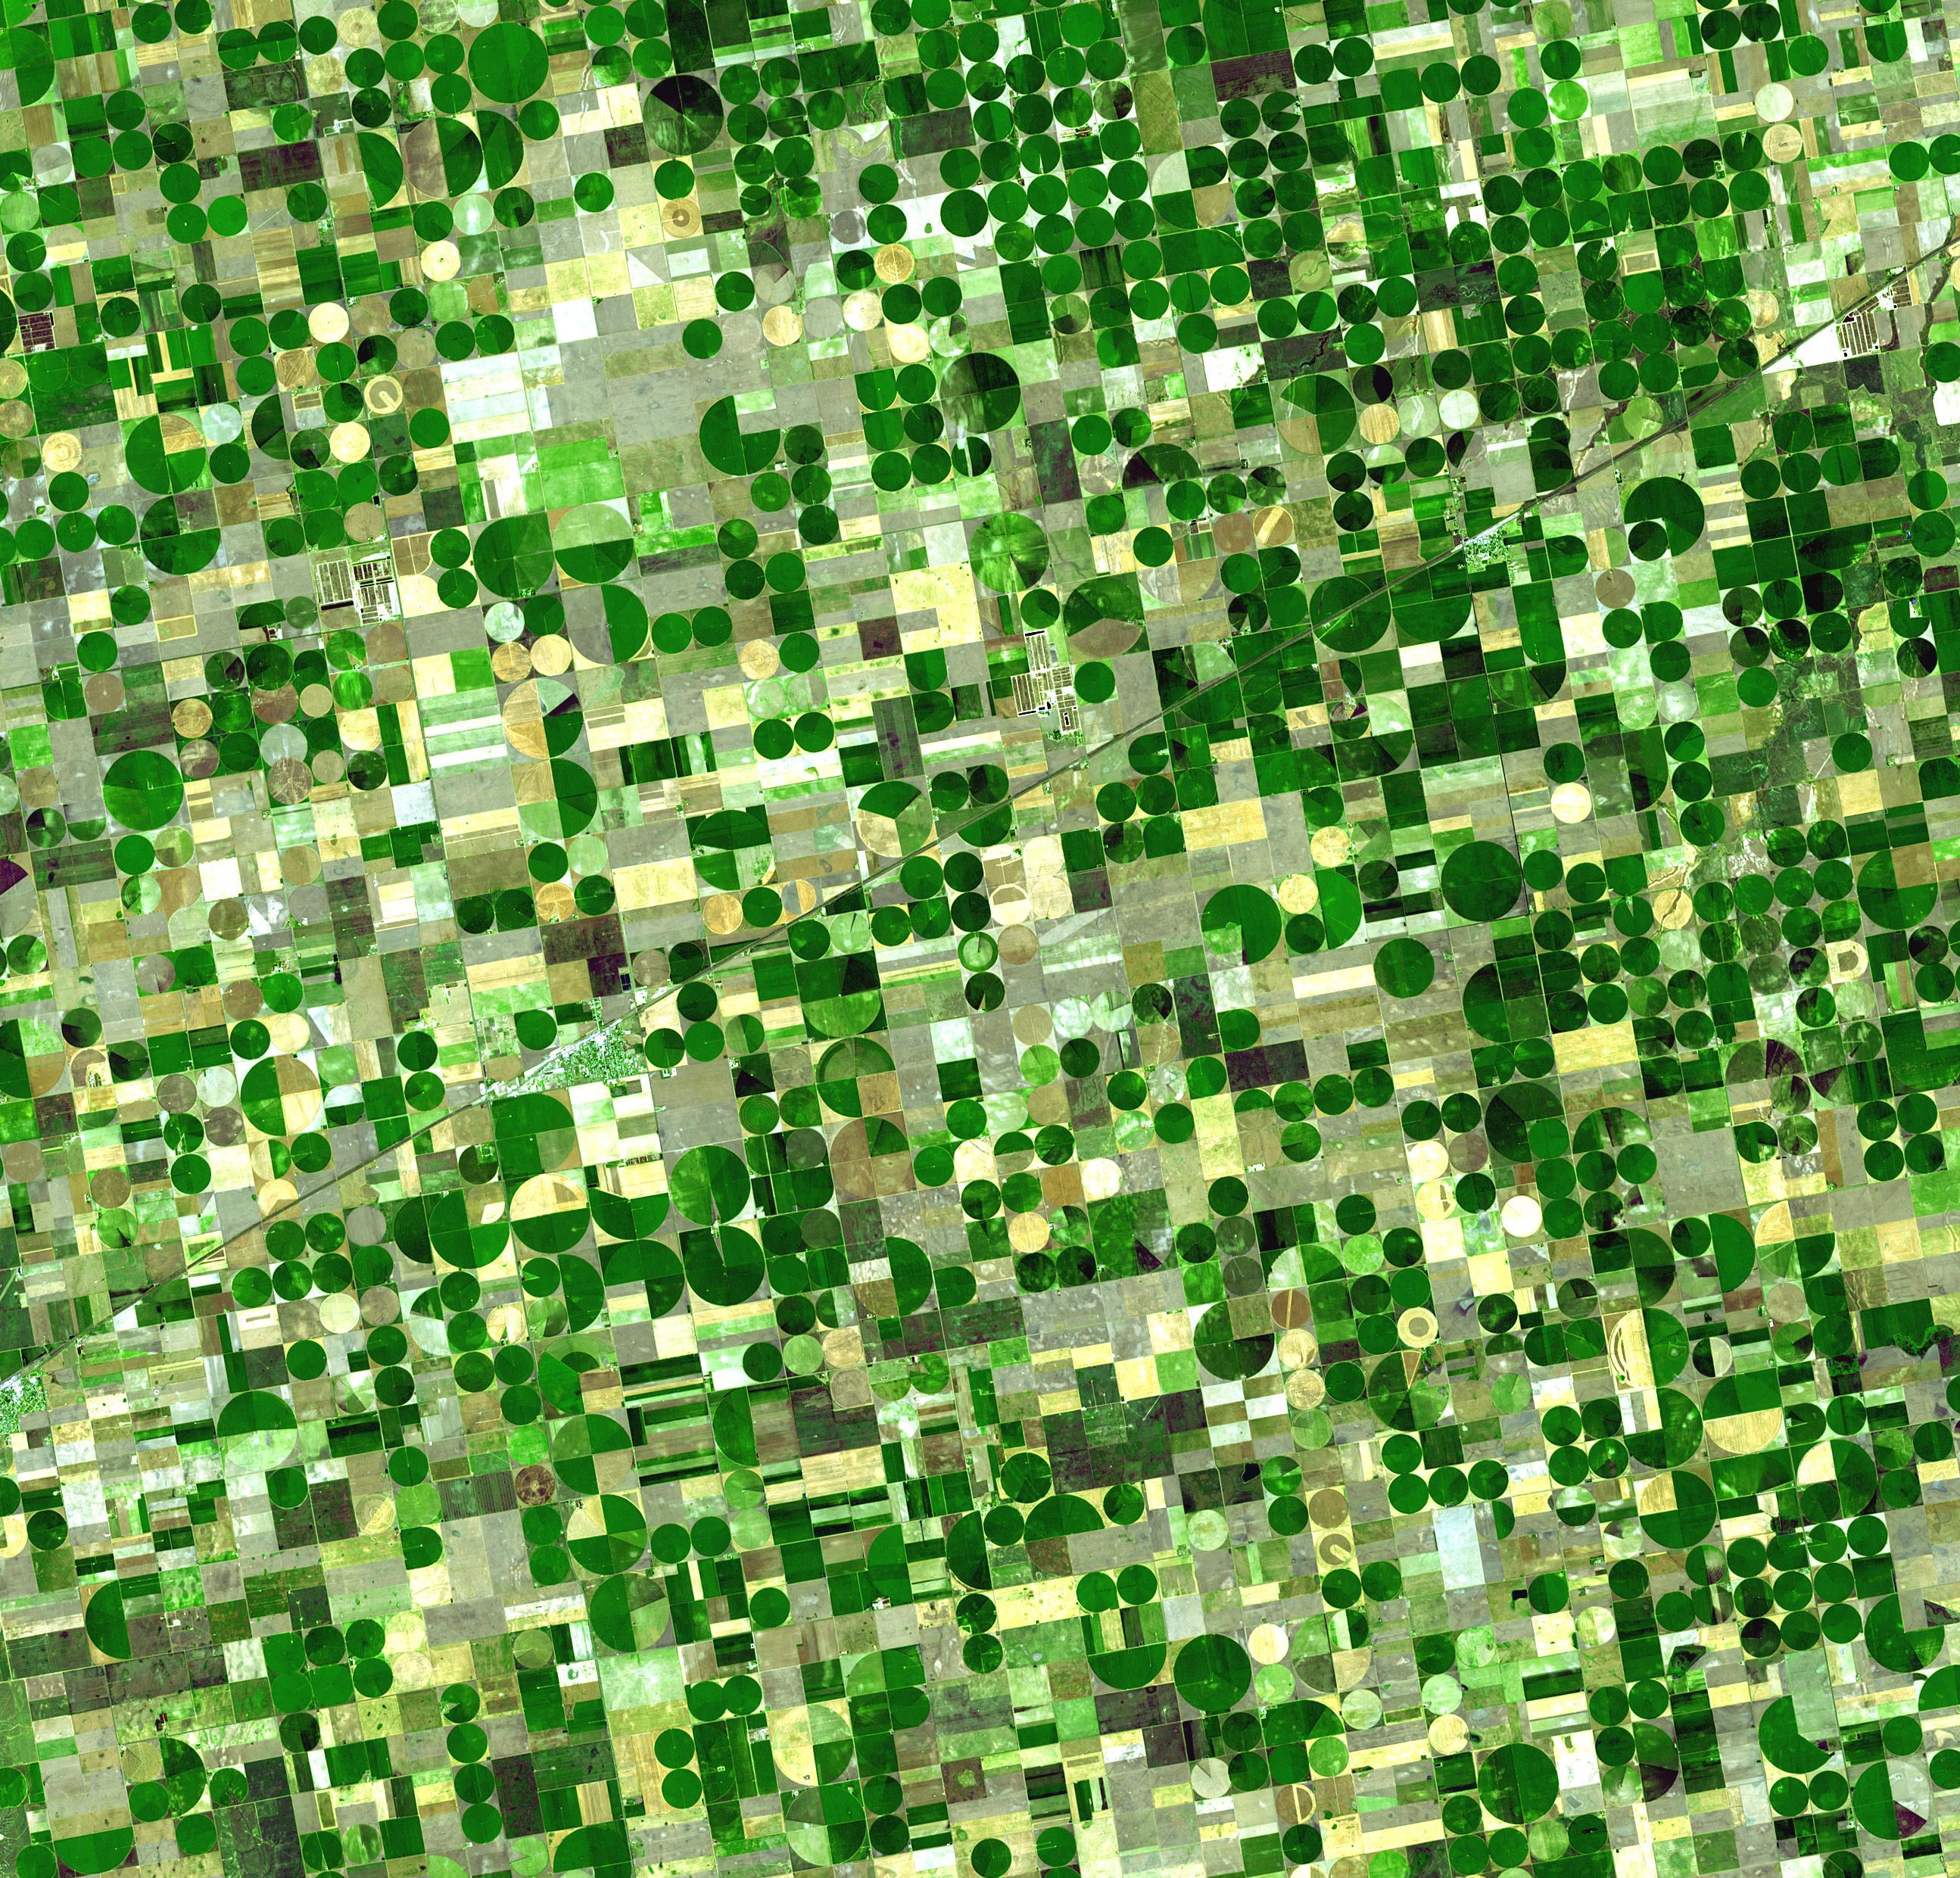 Kansas brown county everest - Finney County Kansas